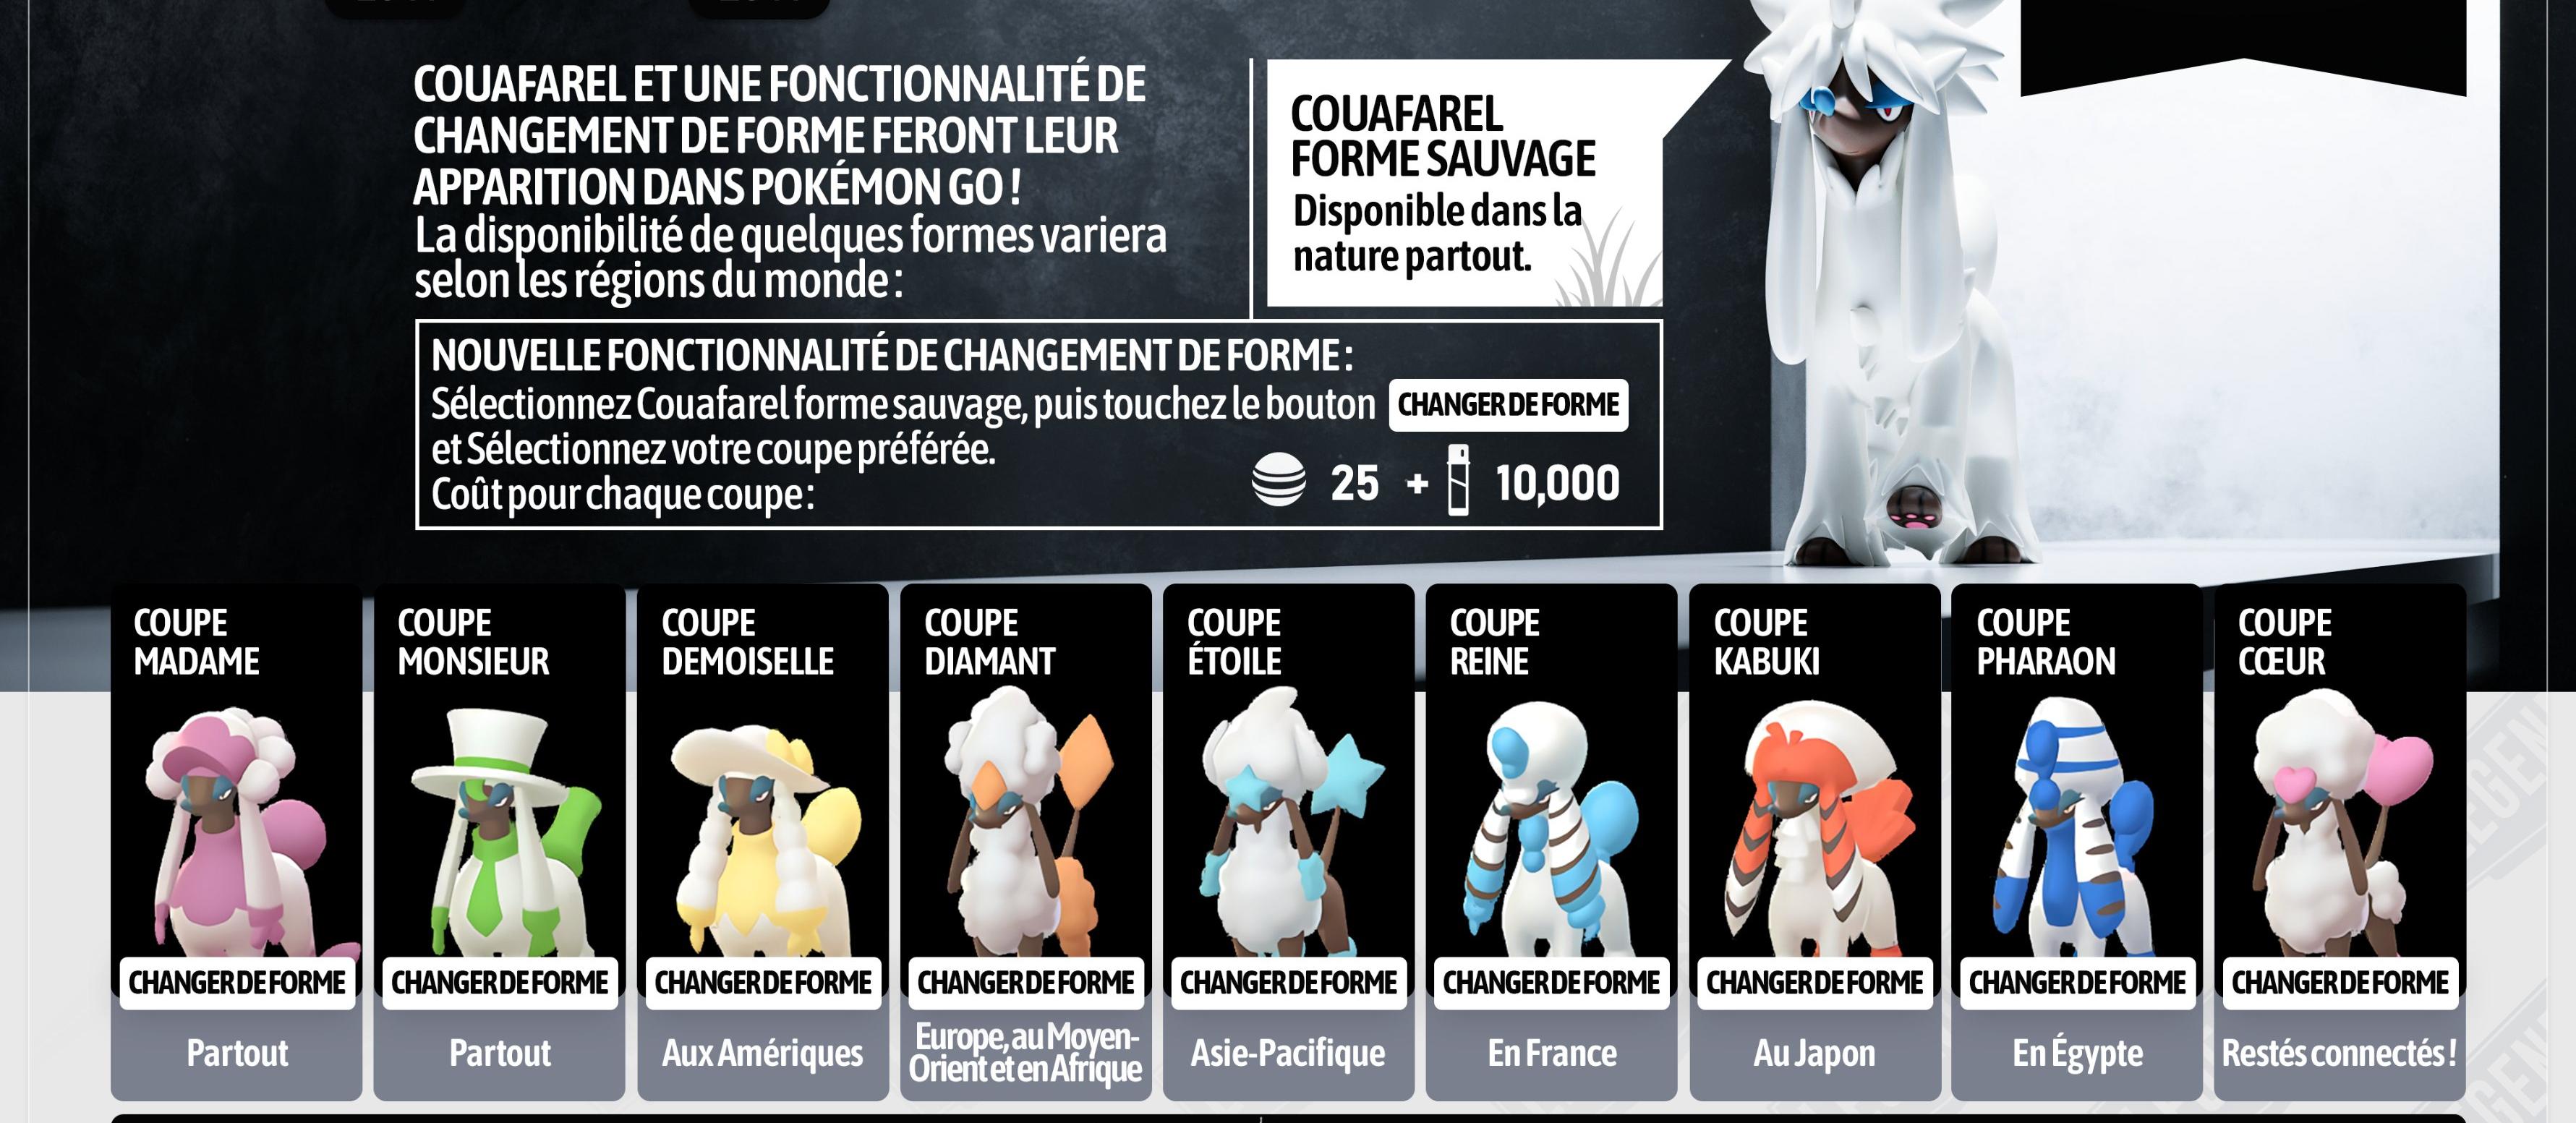 couafarel-pokemon-go-forme-coupe